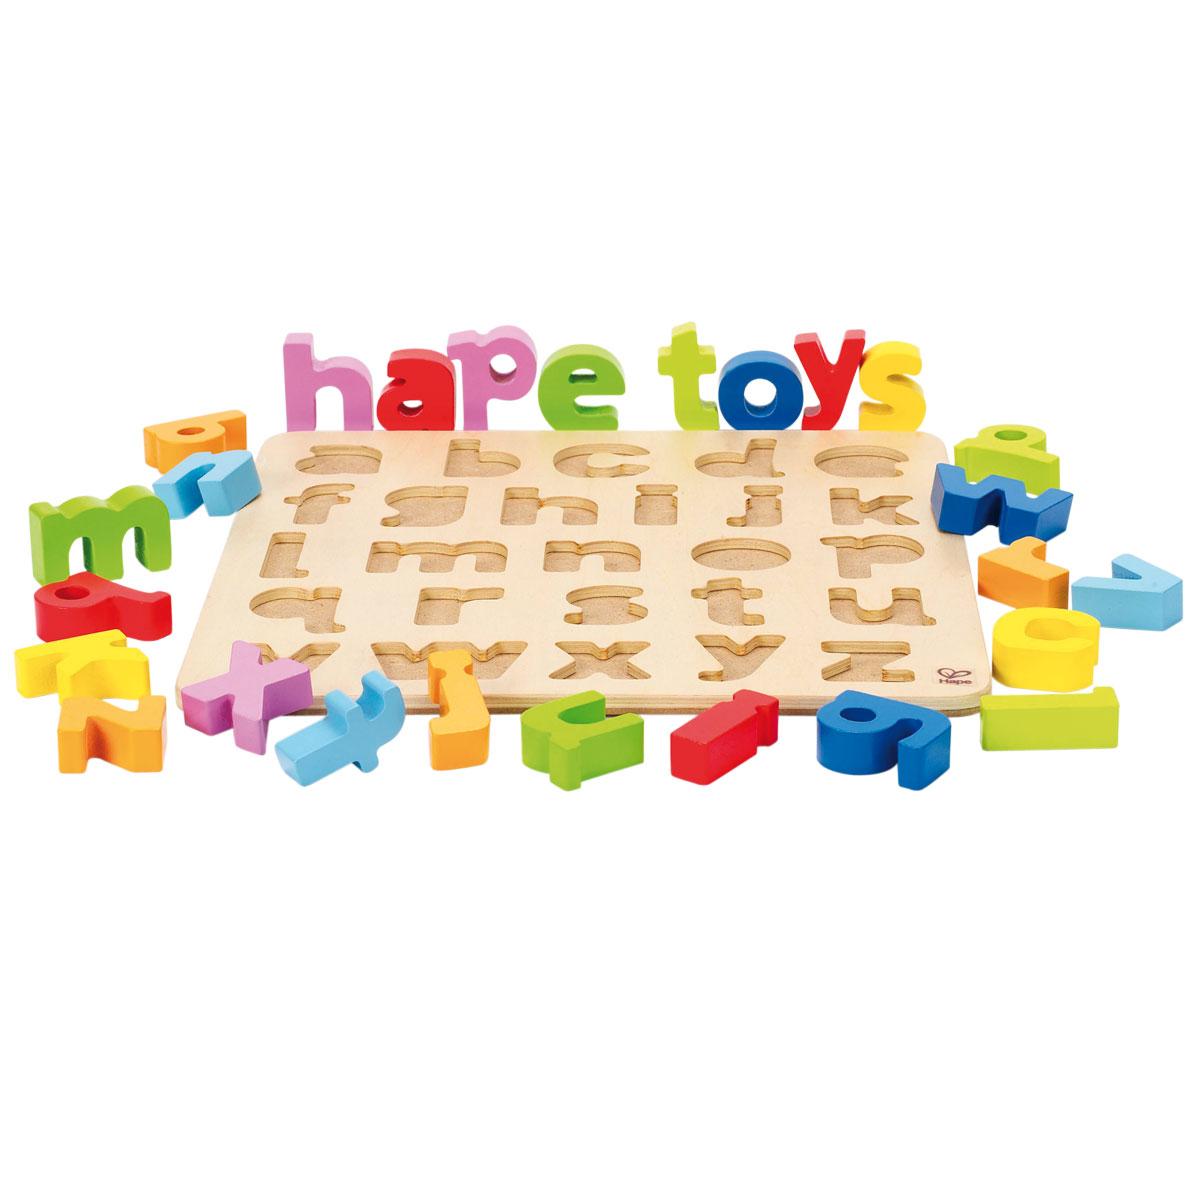 hape steckpuzzle alphabet puzzle aus holz f r kinder ebay. Black Bedroom Furniture Sets. Home Design Ideas